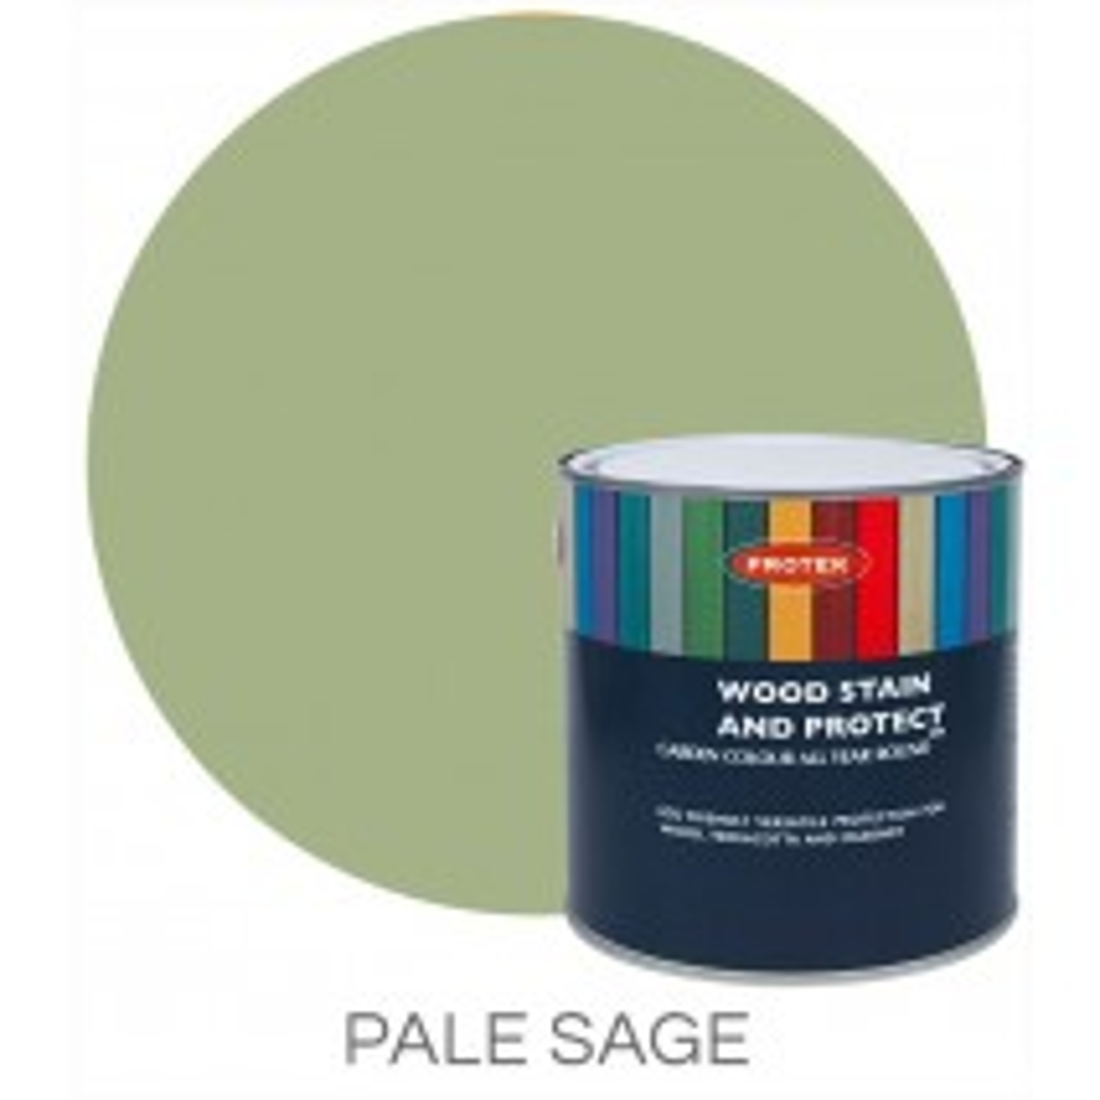 Protek Wood Stain & Protector - Pale Sage (5 litre)